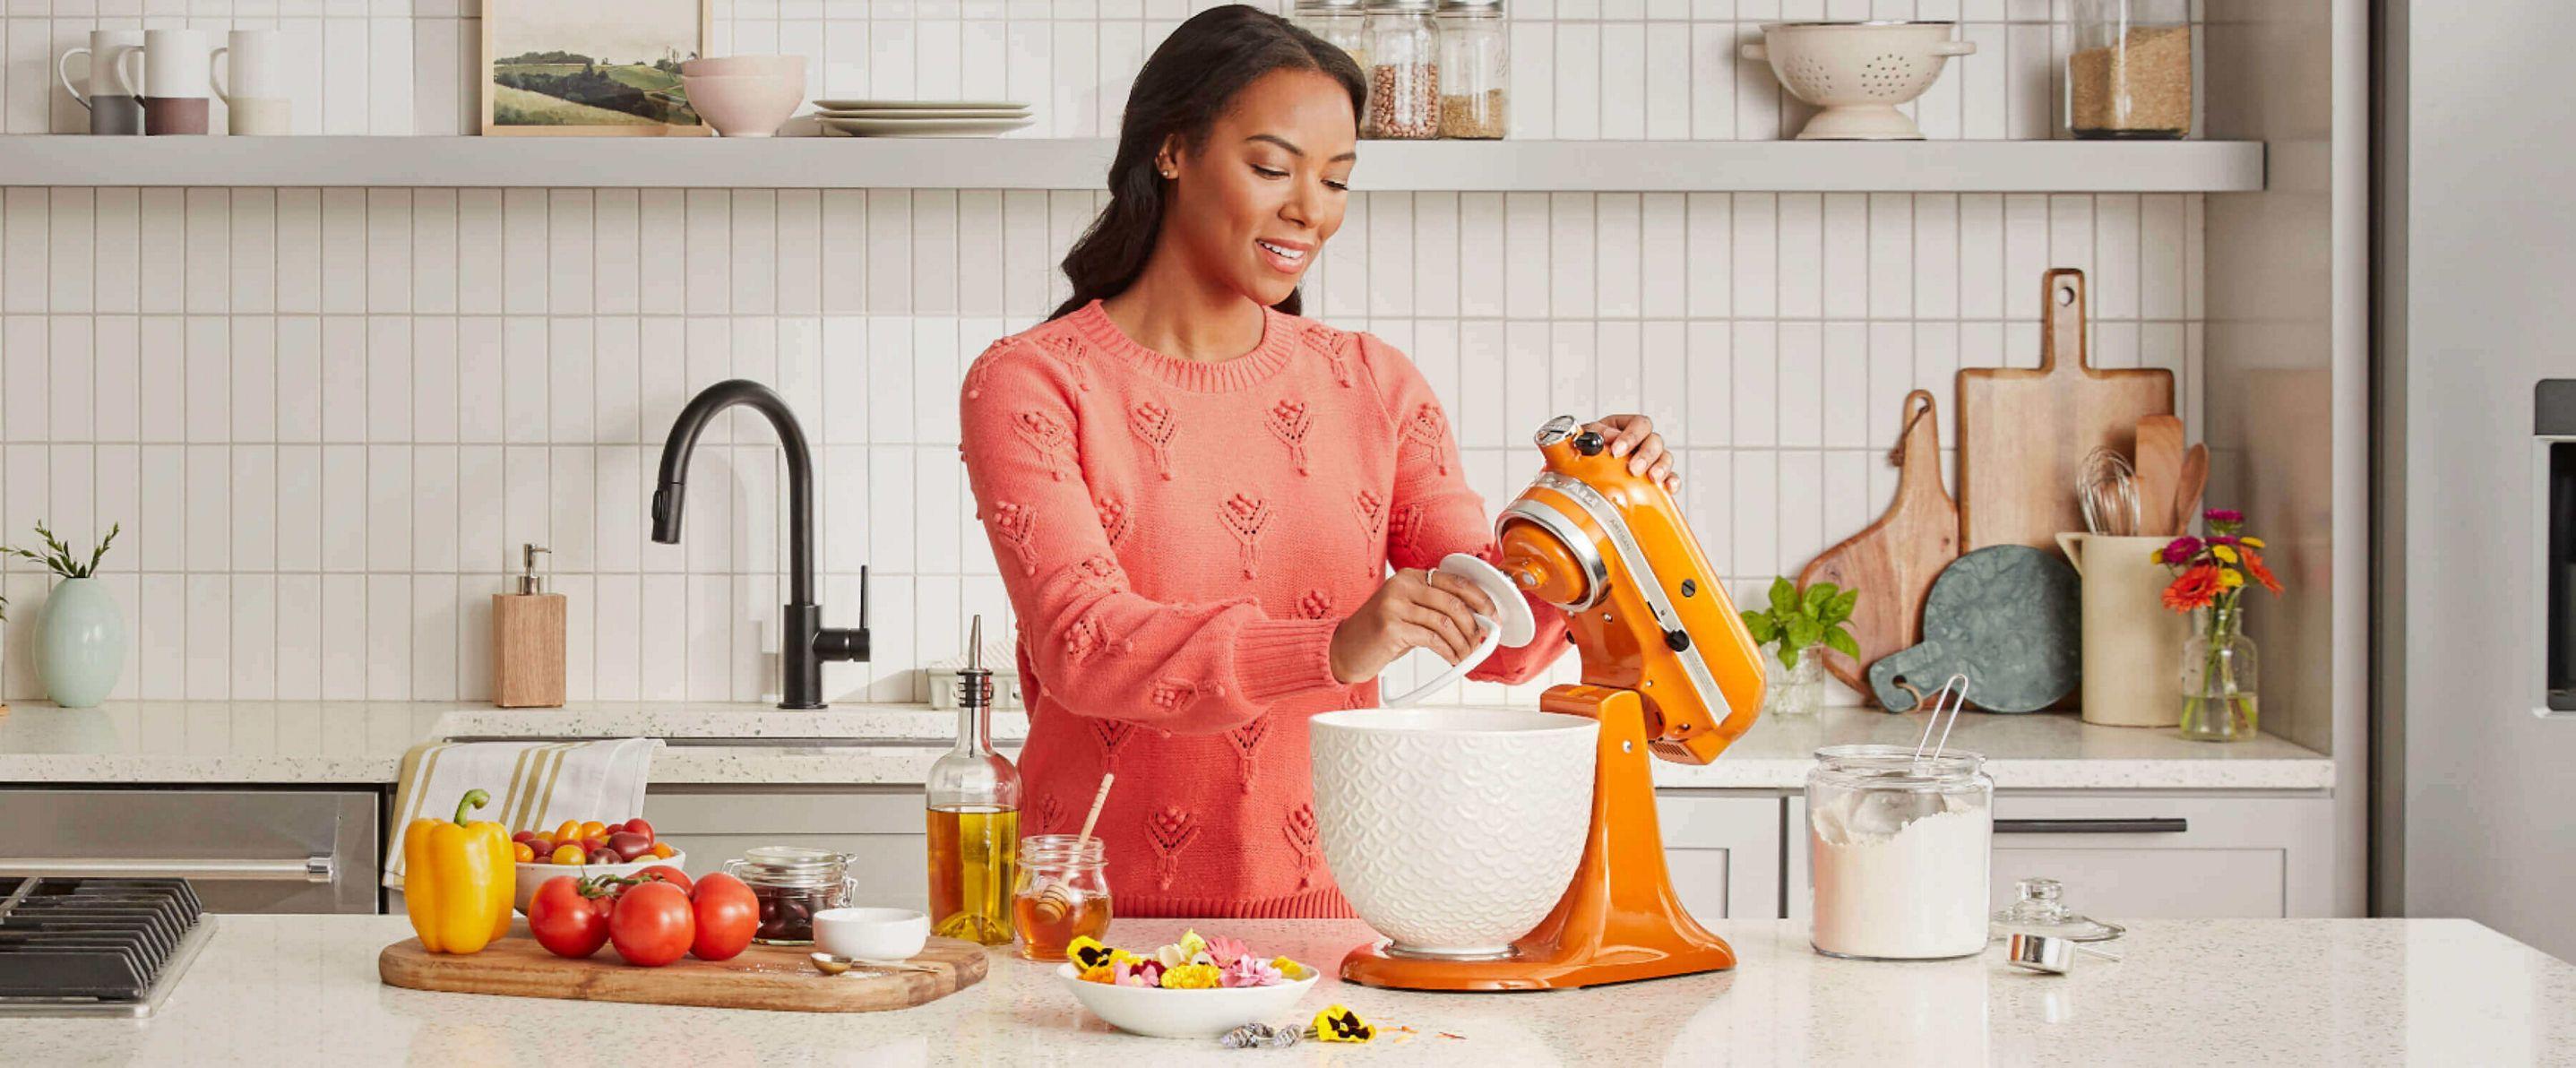 A person baking using a KitchenAid® stand mixer